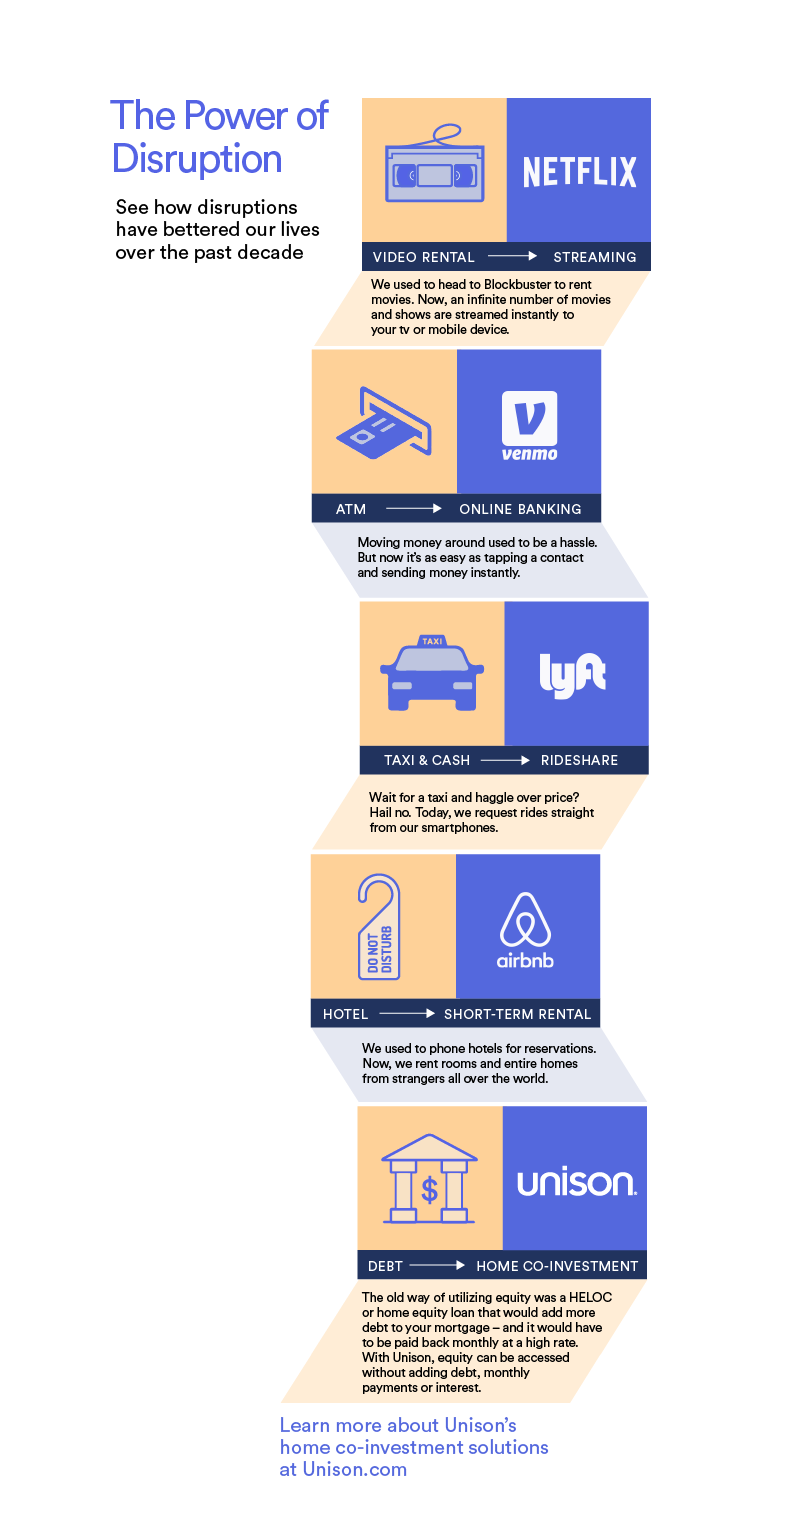 A Brief History of Disruption